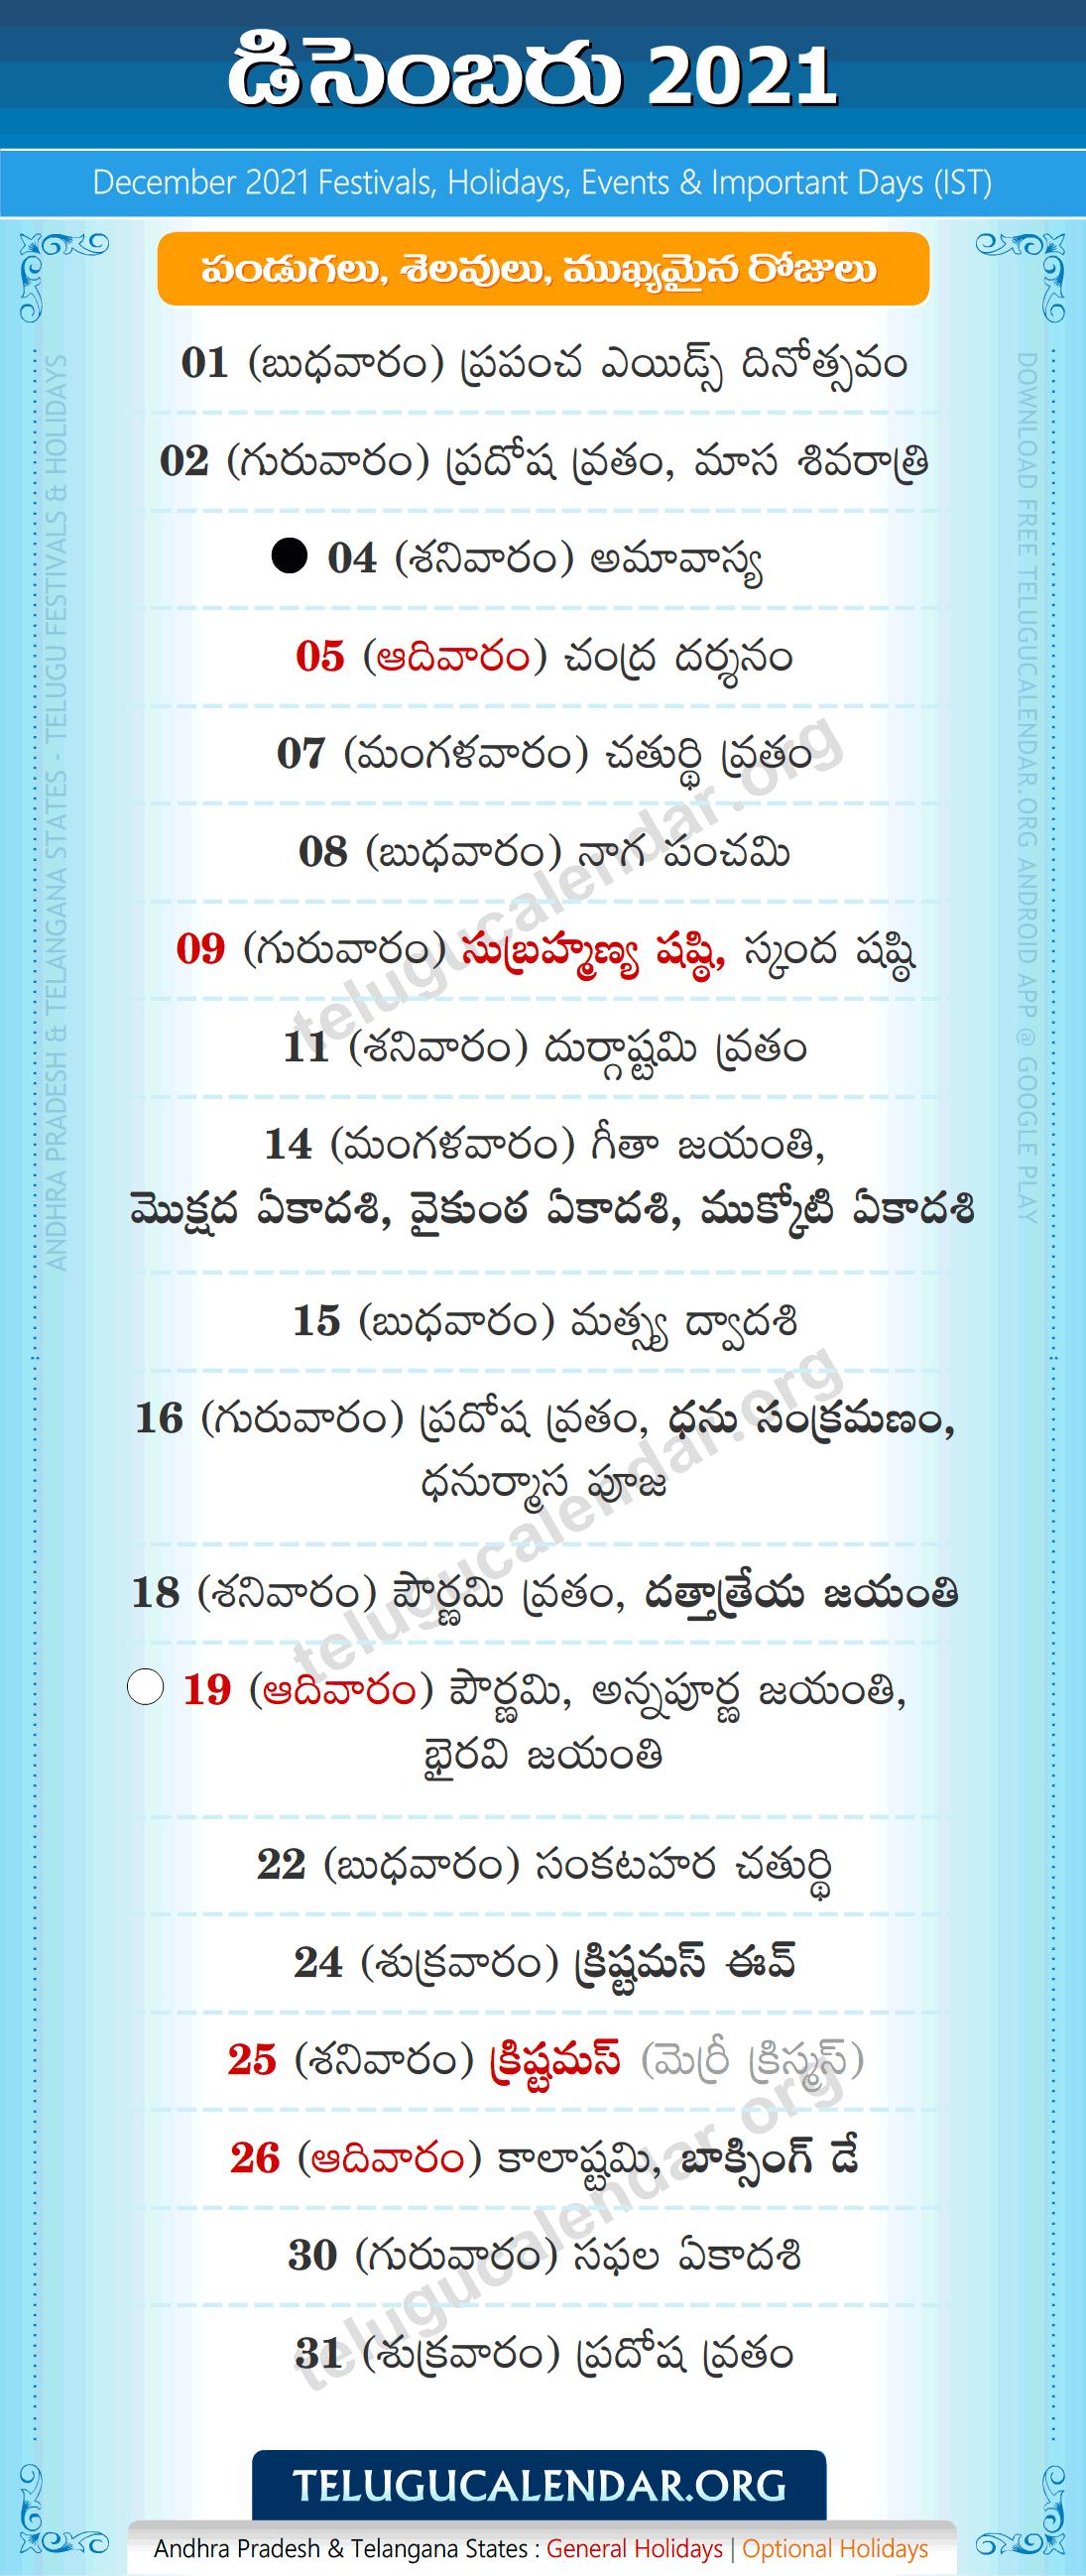 Telugu Festivals 2021 December